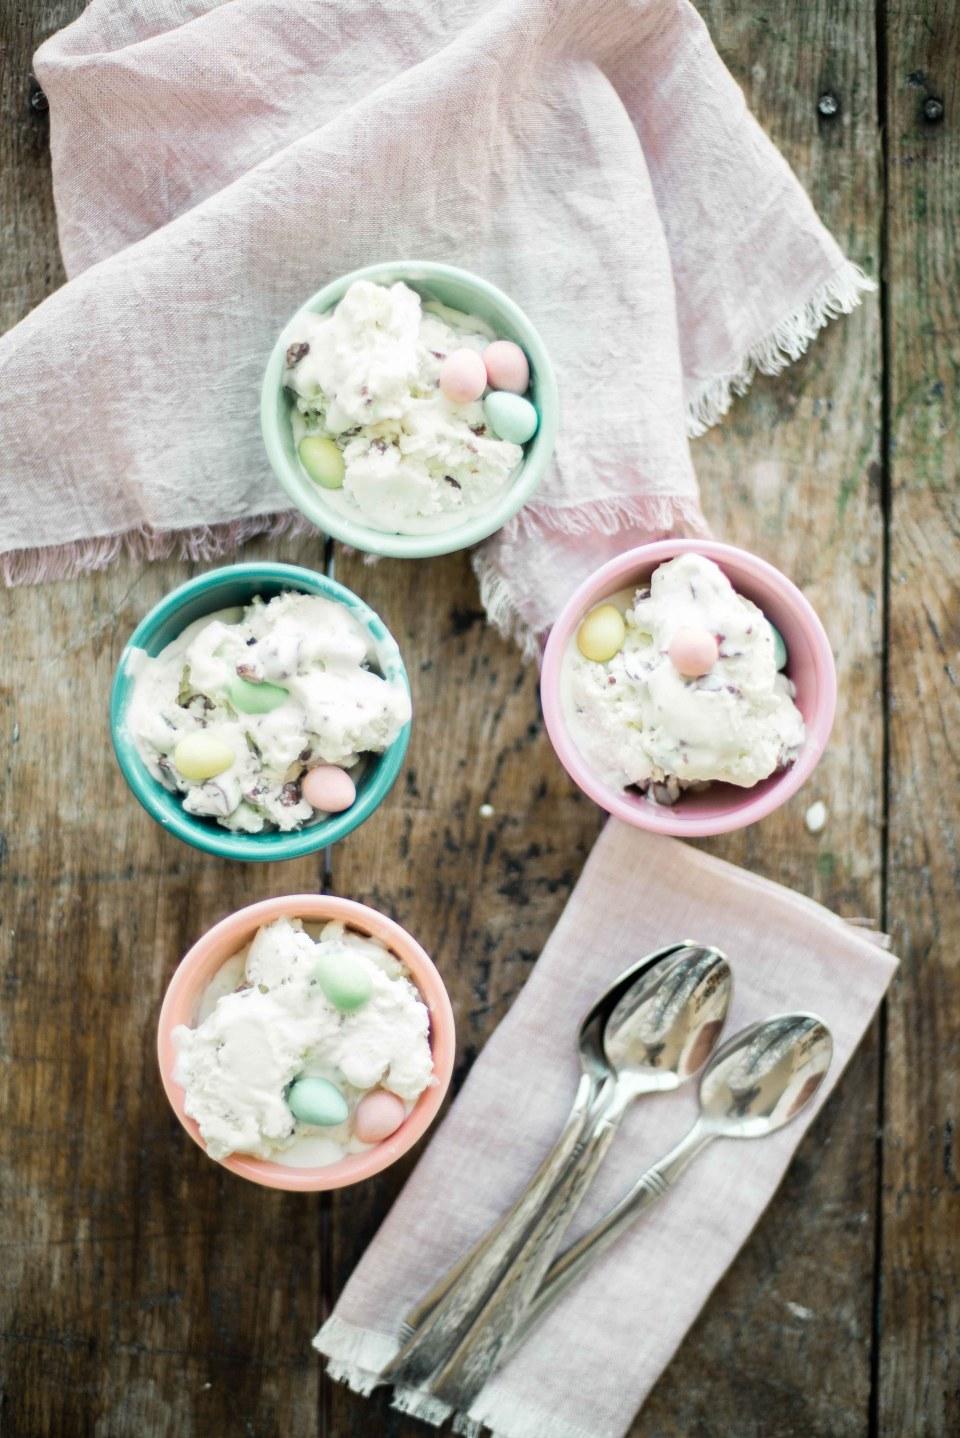 Homemade Ice Cream with Cadbury Mini eggs for Easter!